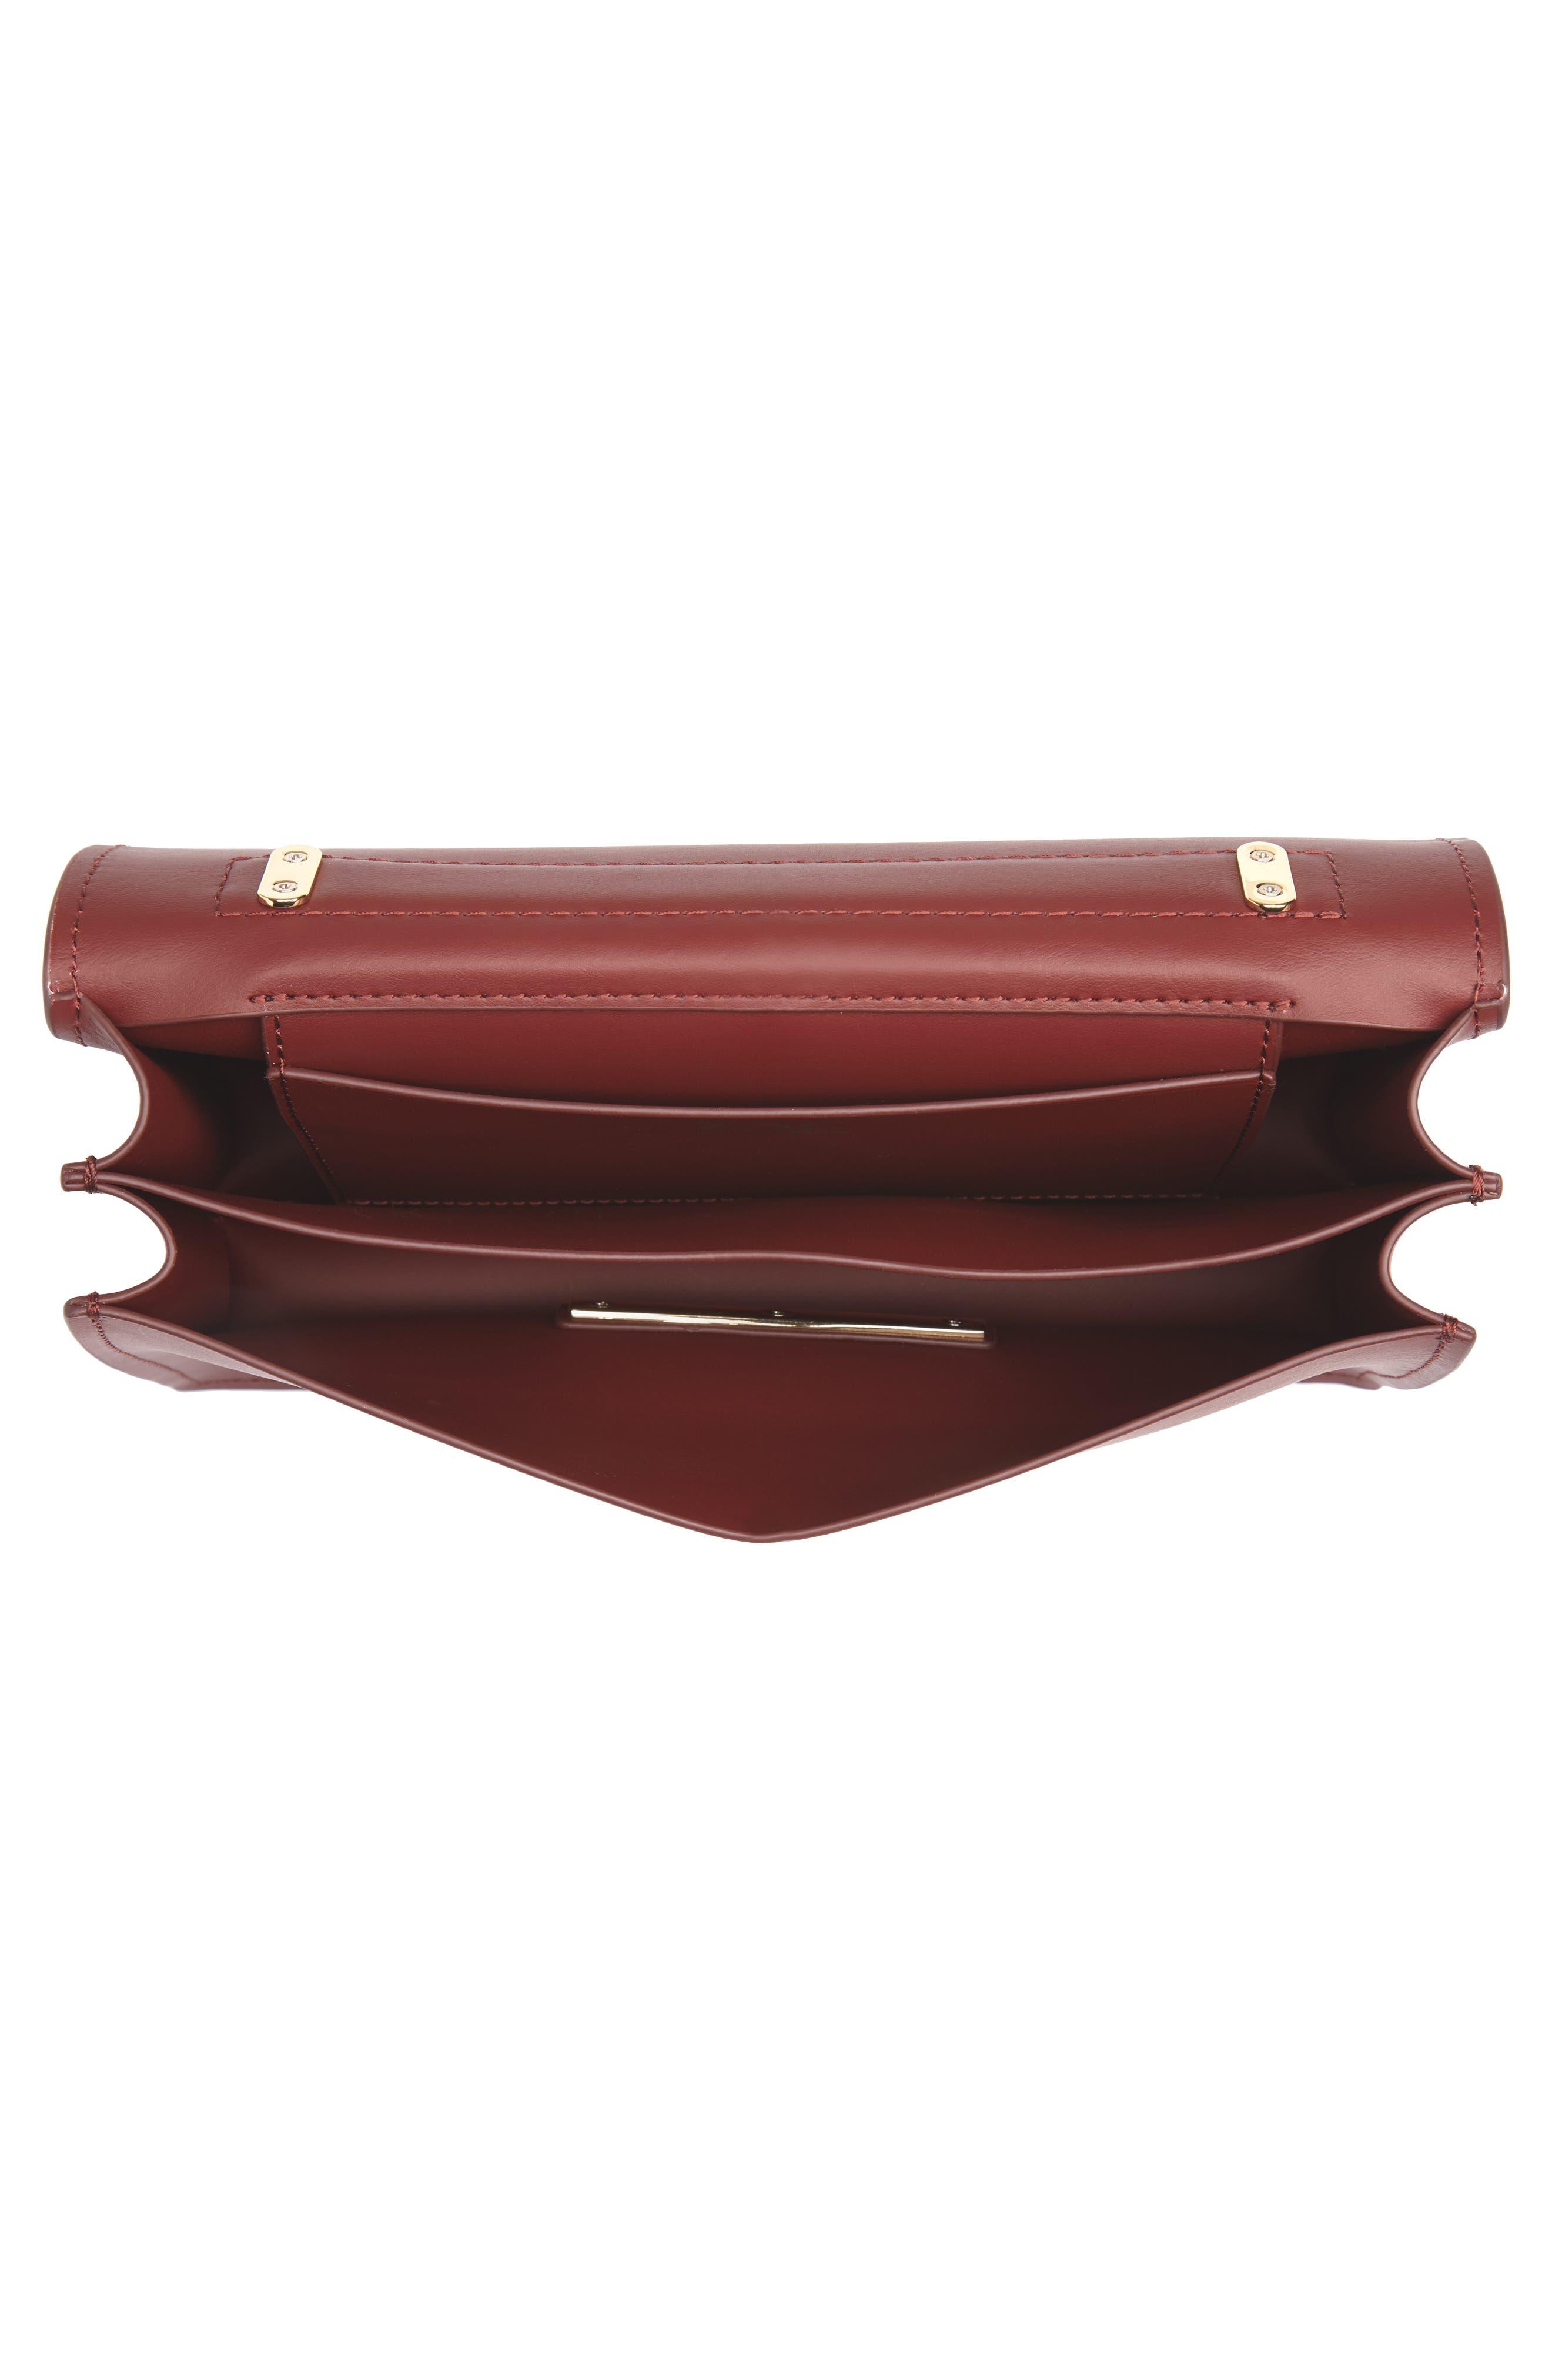 Earthette Leather Accordion Bag,                             Alternate thumbnail 4, color,                             SMOKED MERLOT